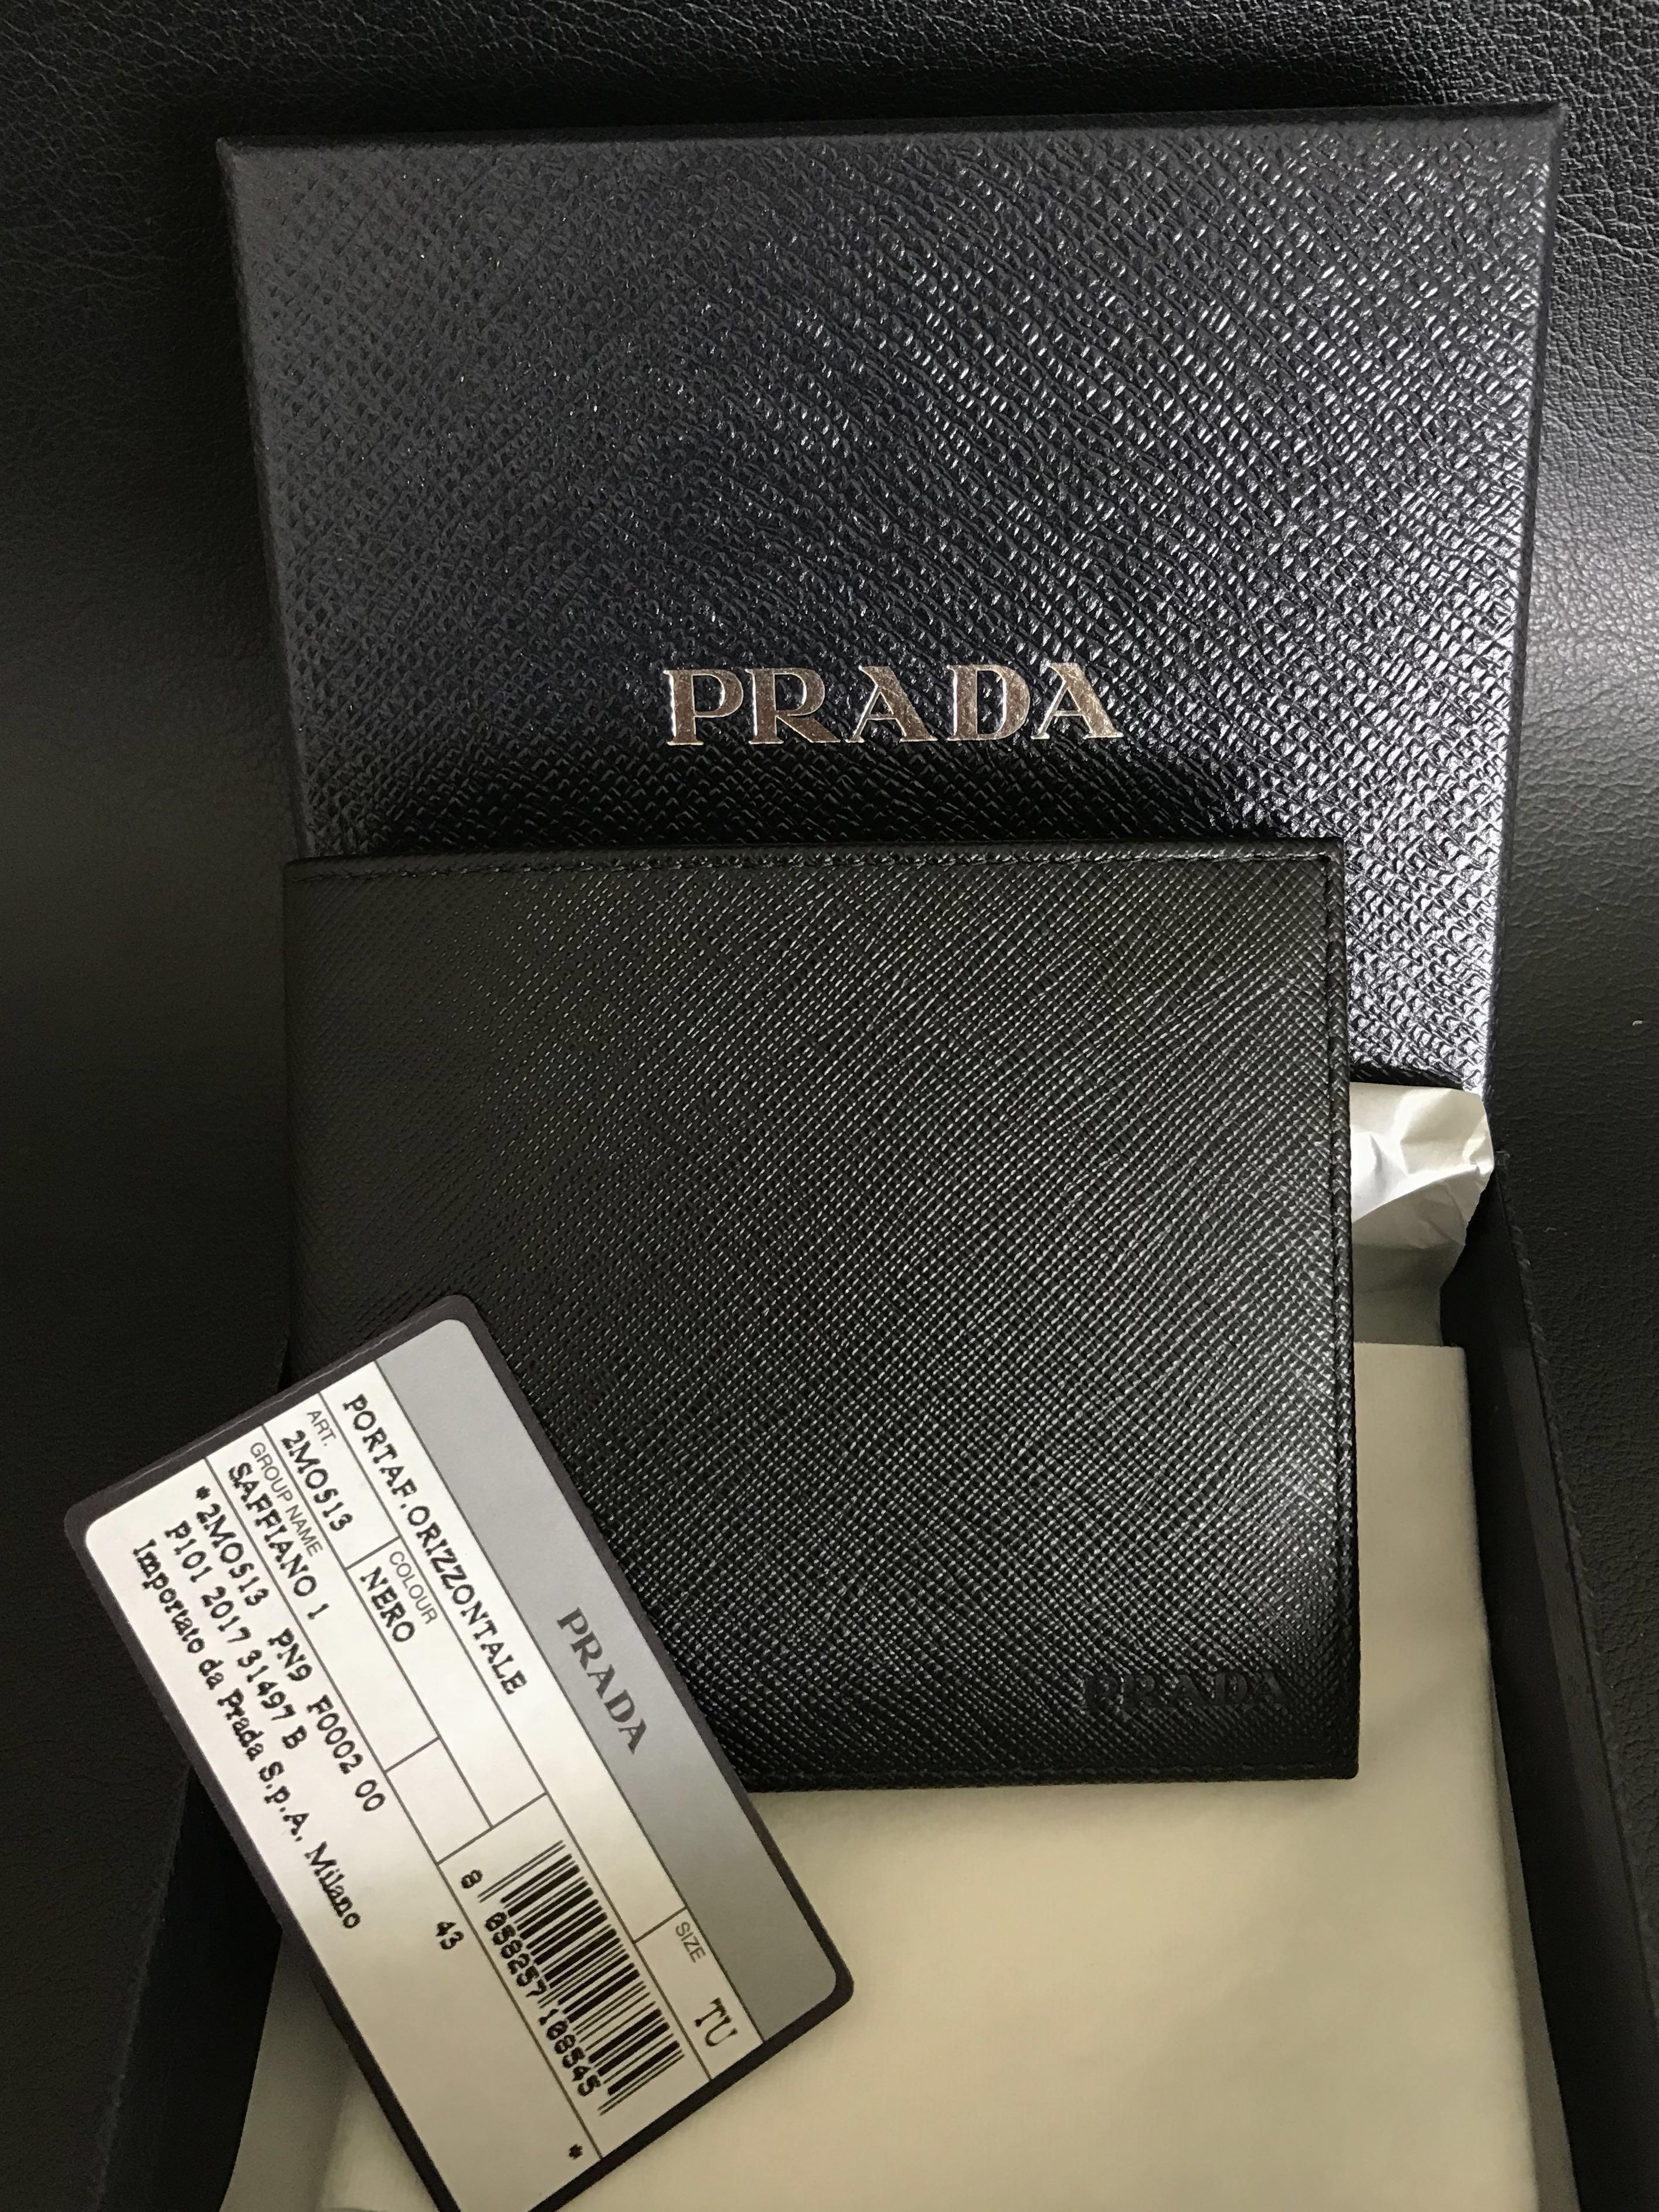 6e81ebbd96b1 Prada Saffiano Men's Wallet Embossed (Black), Men's Fashion, Bags ...